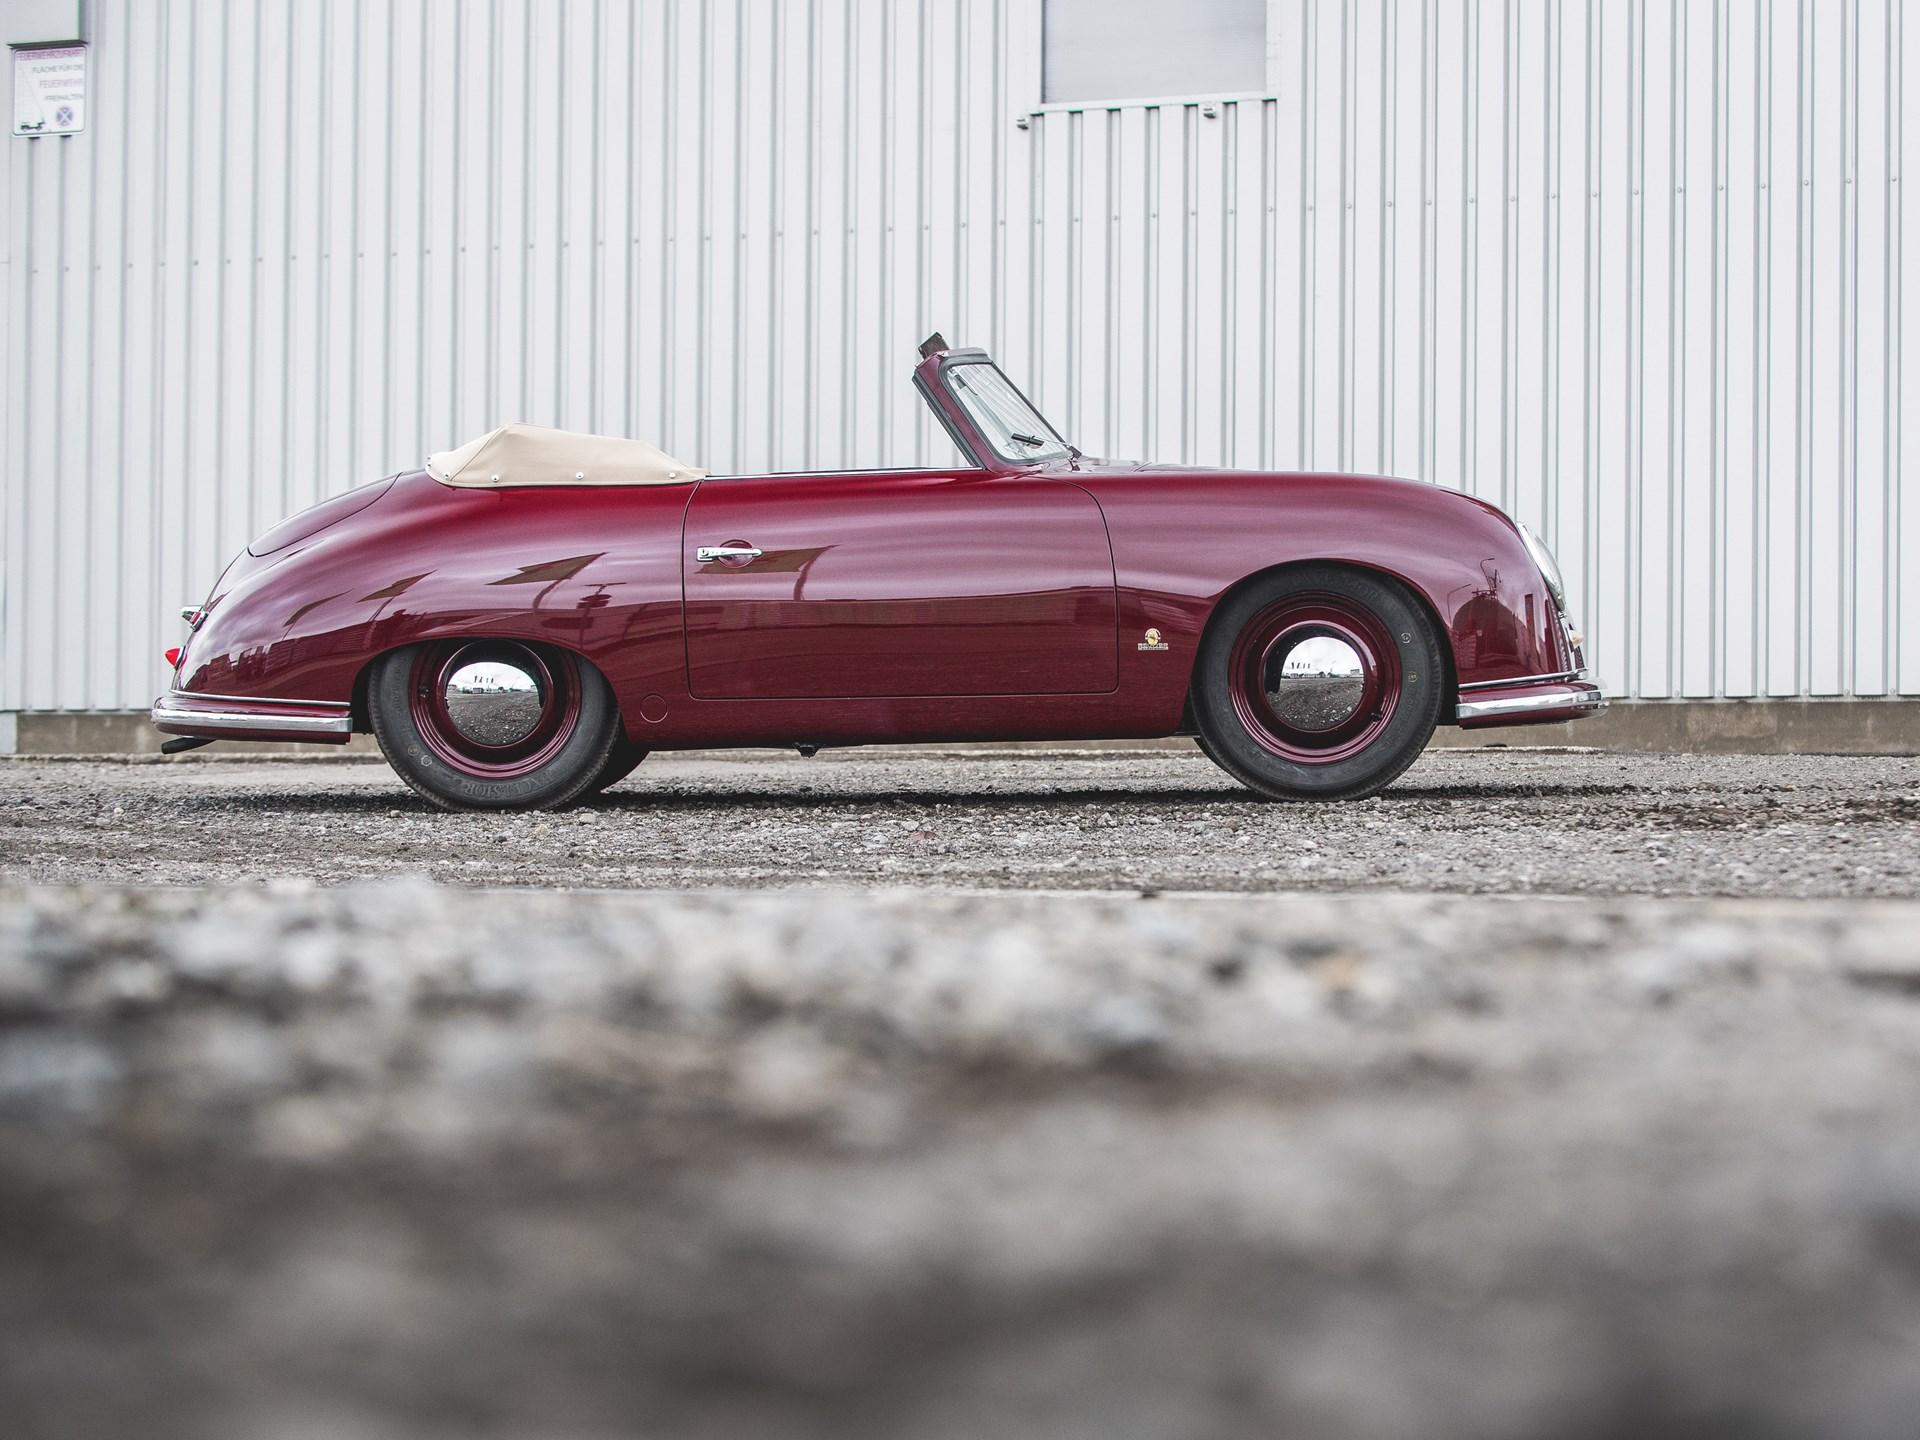 1951 Porsche 356 1300 'Split-Window' Cabriolet by Reutter